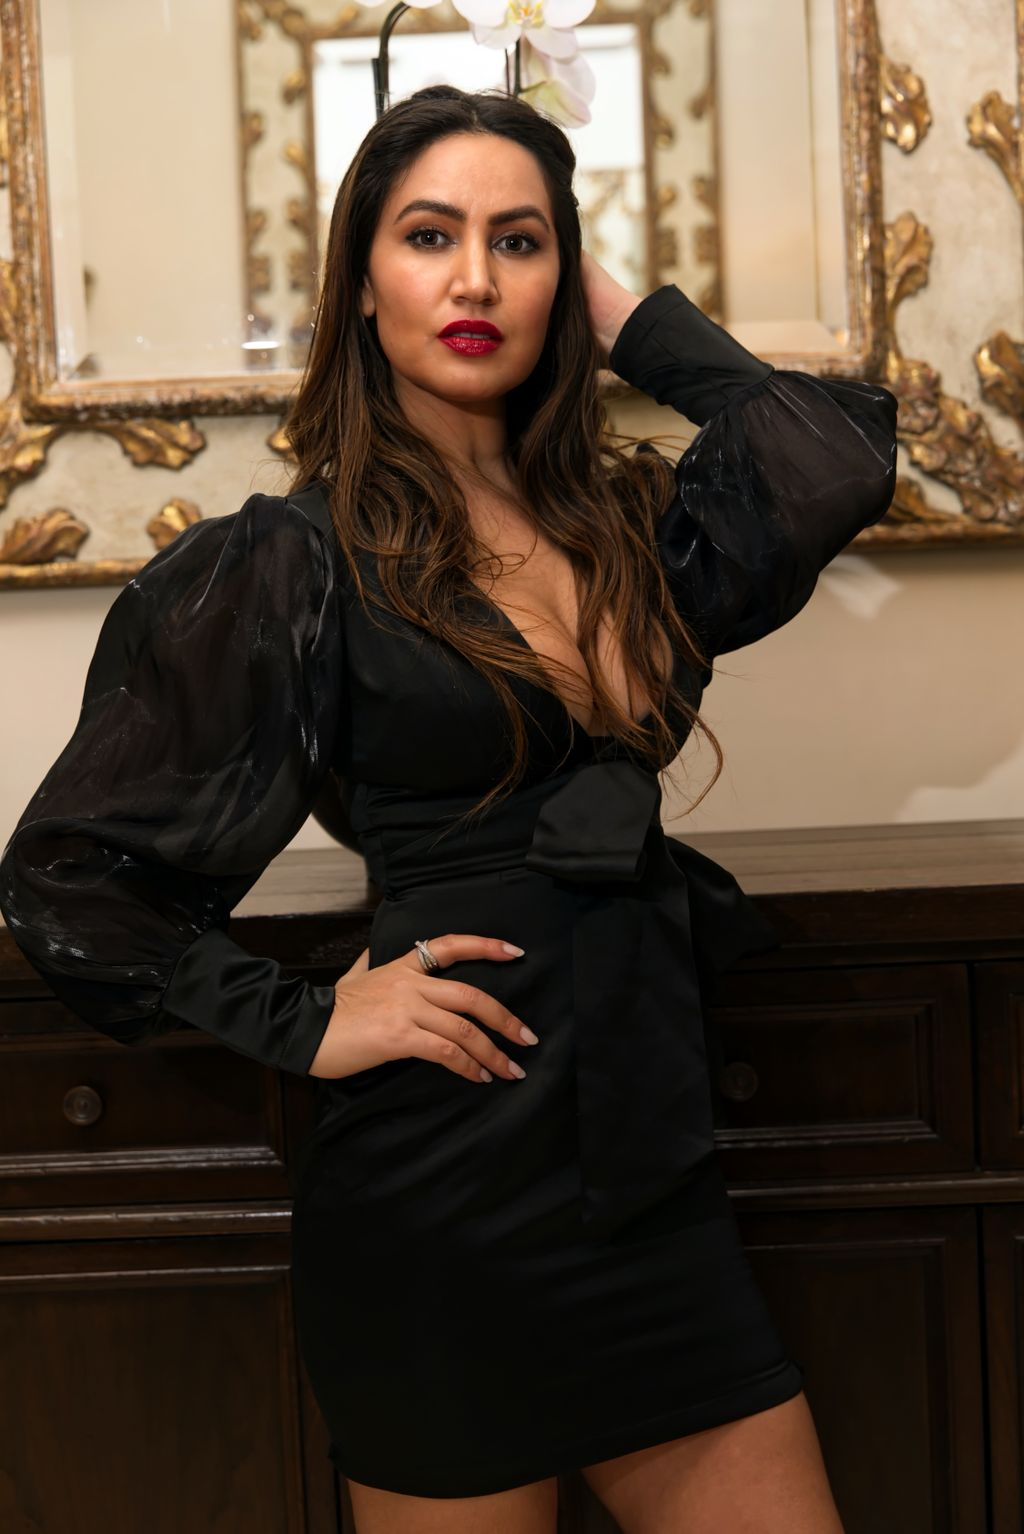 RIANNA LEVY - Fashion & Product Photo Shoot